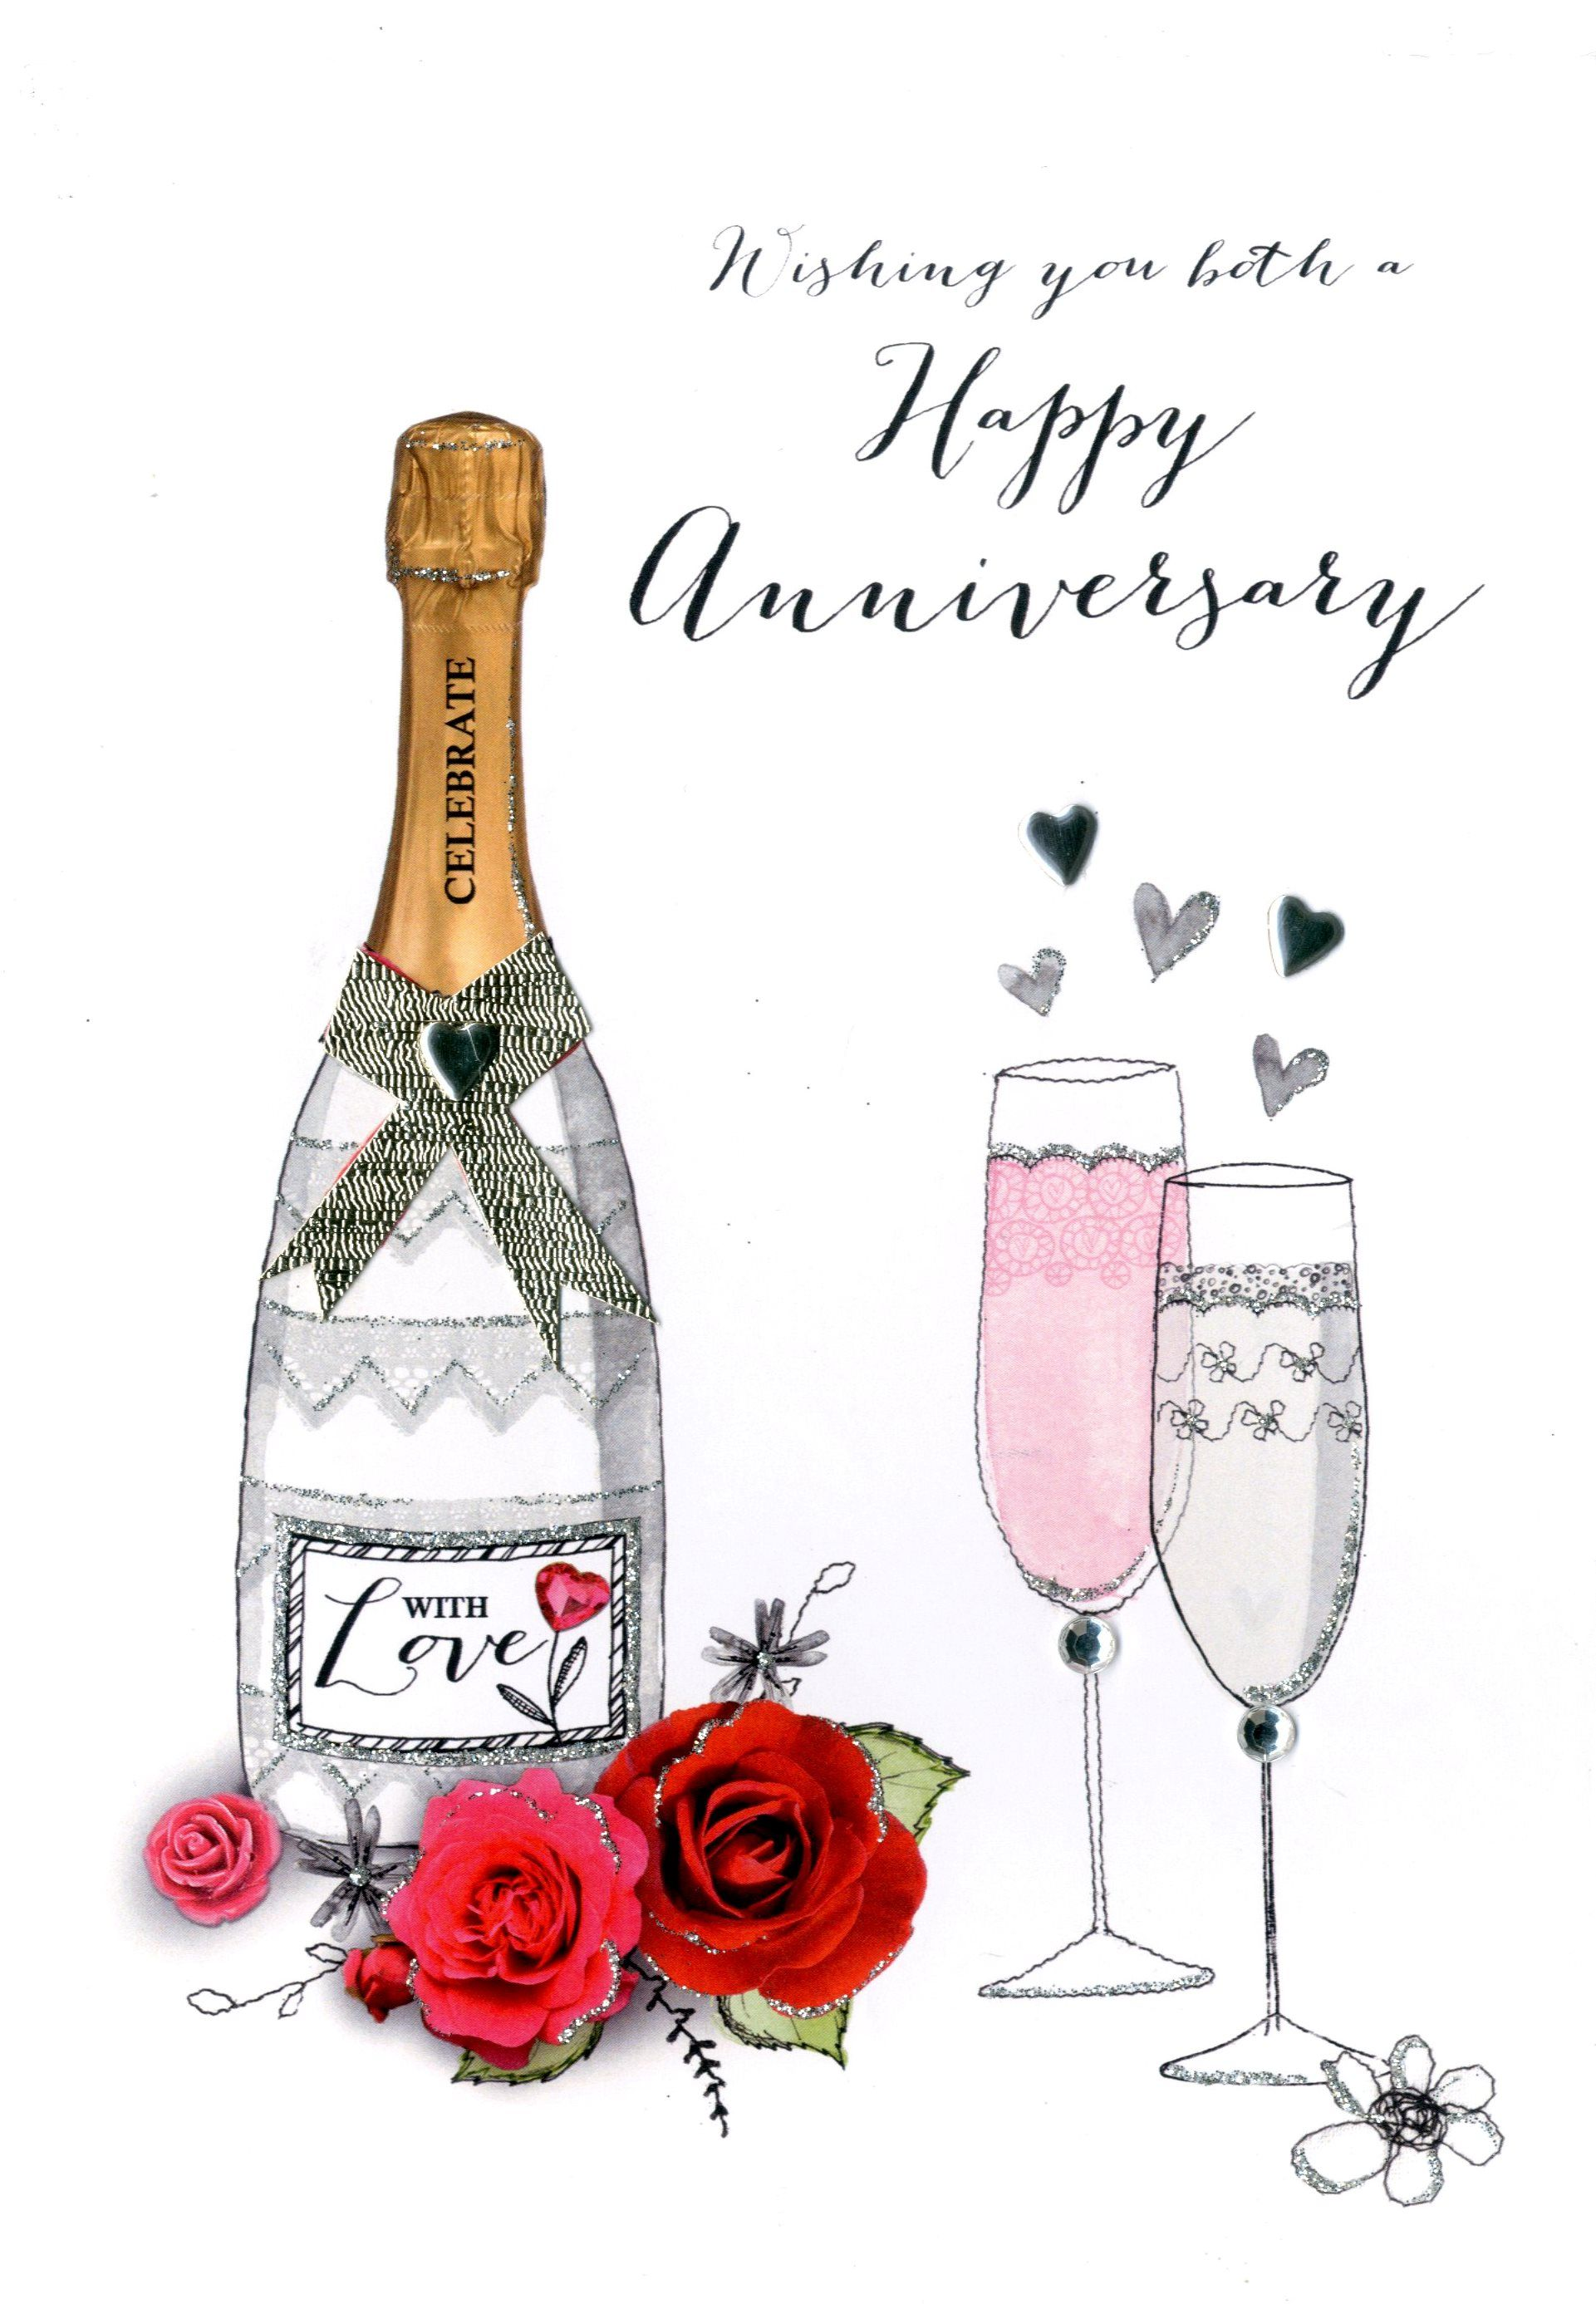 Wishing You Both Happy Anniversary Greeting Card Happy